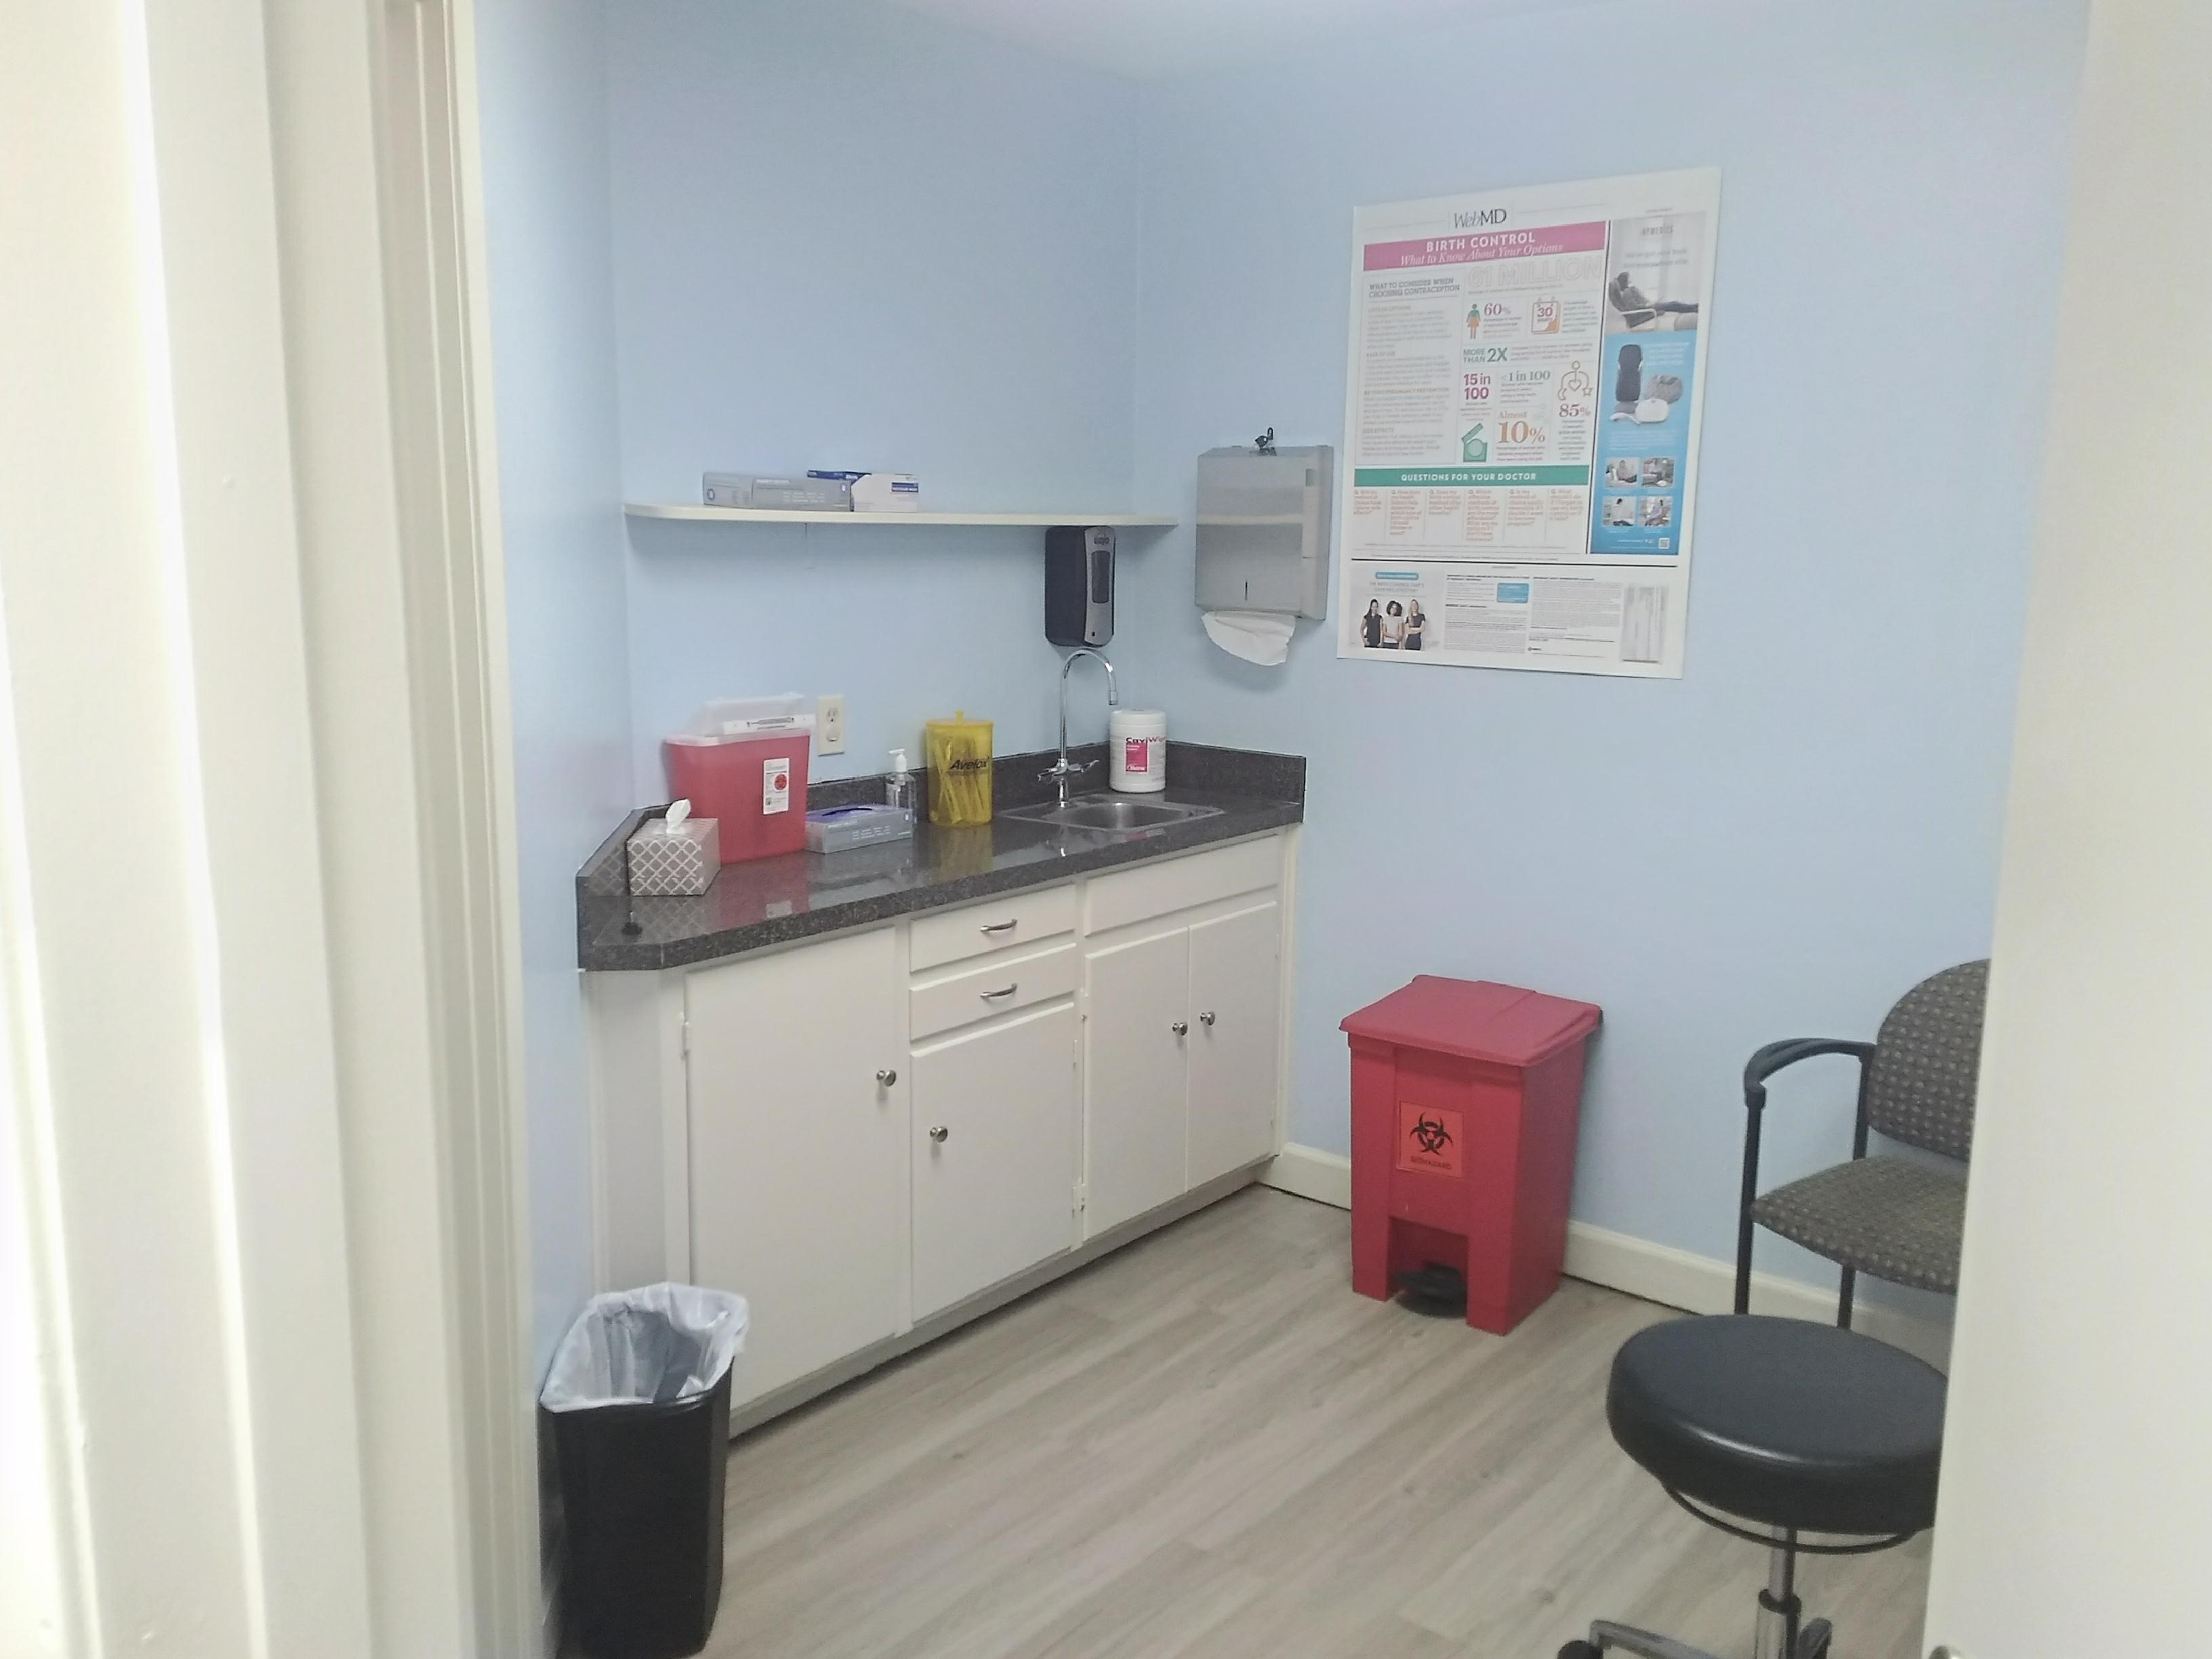 Jordan Family Clinic image 4